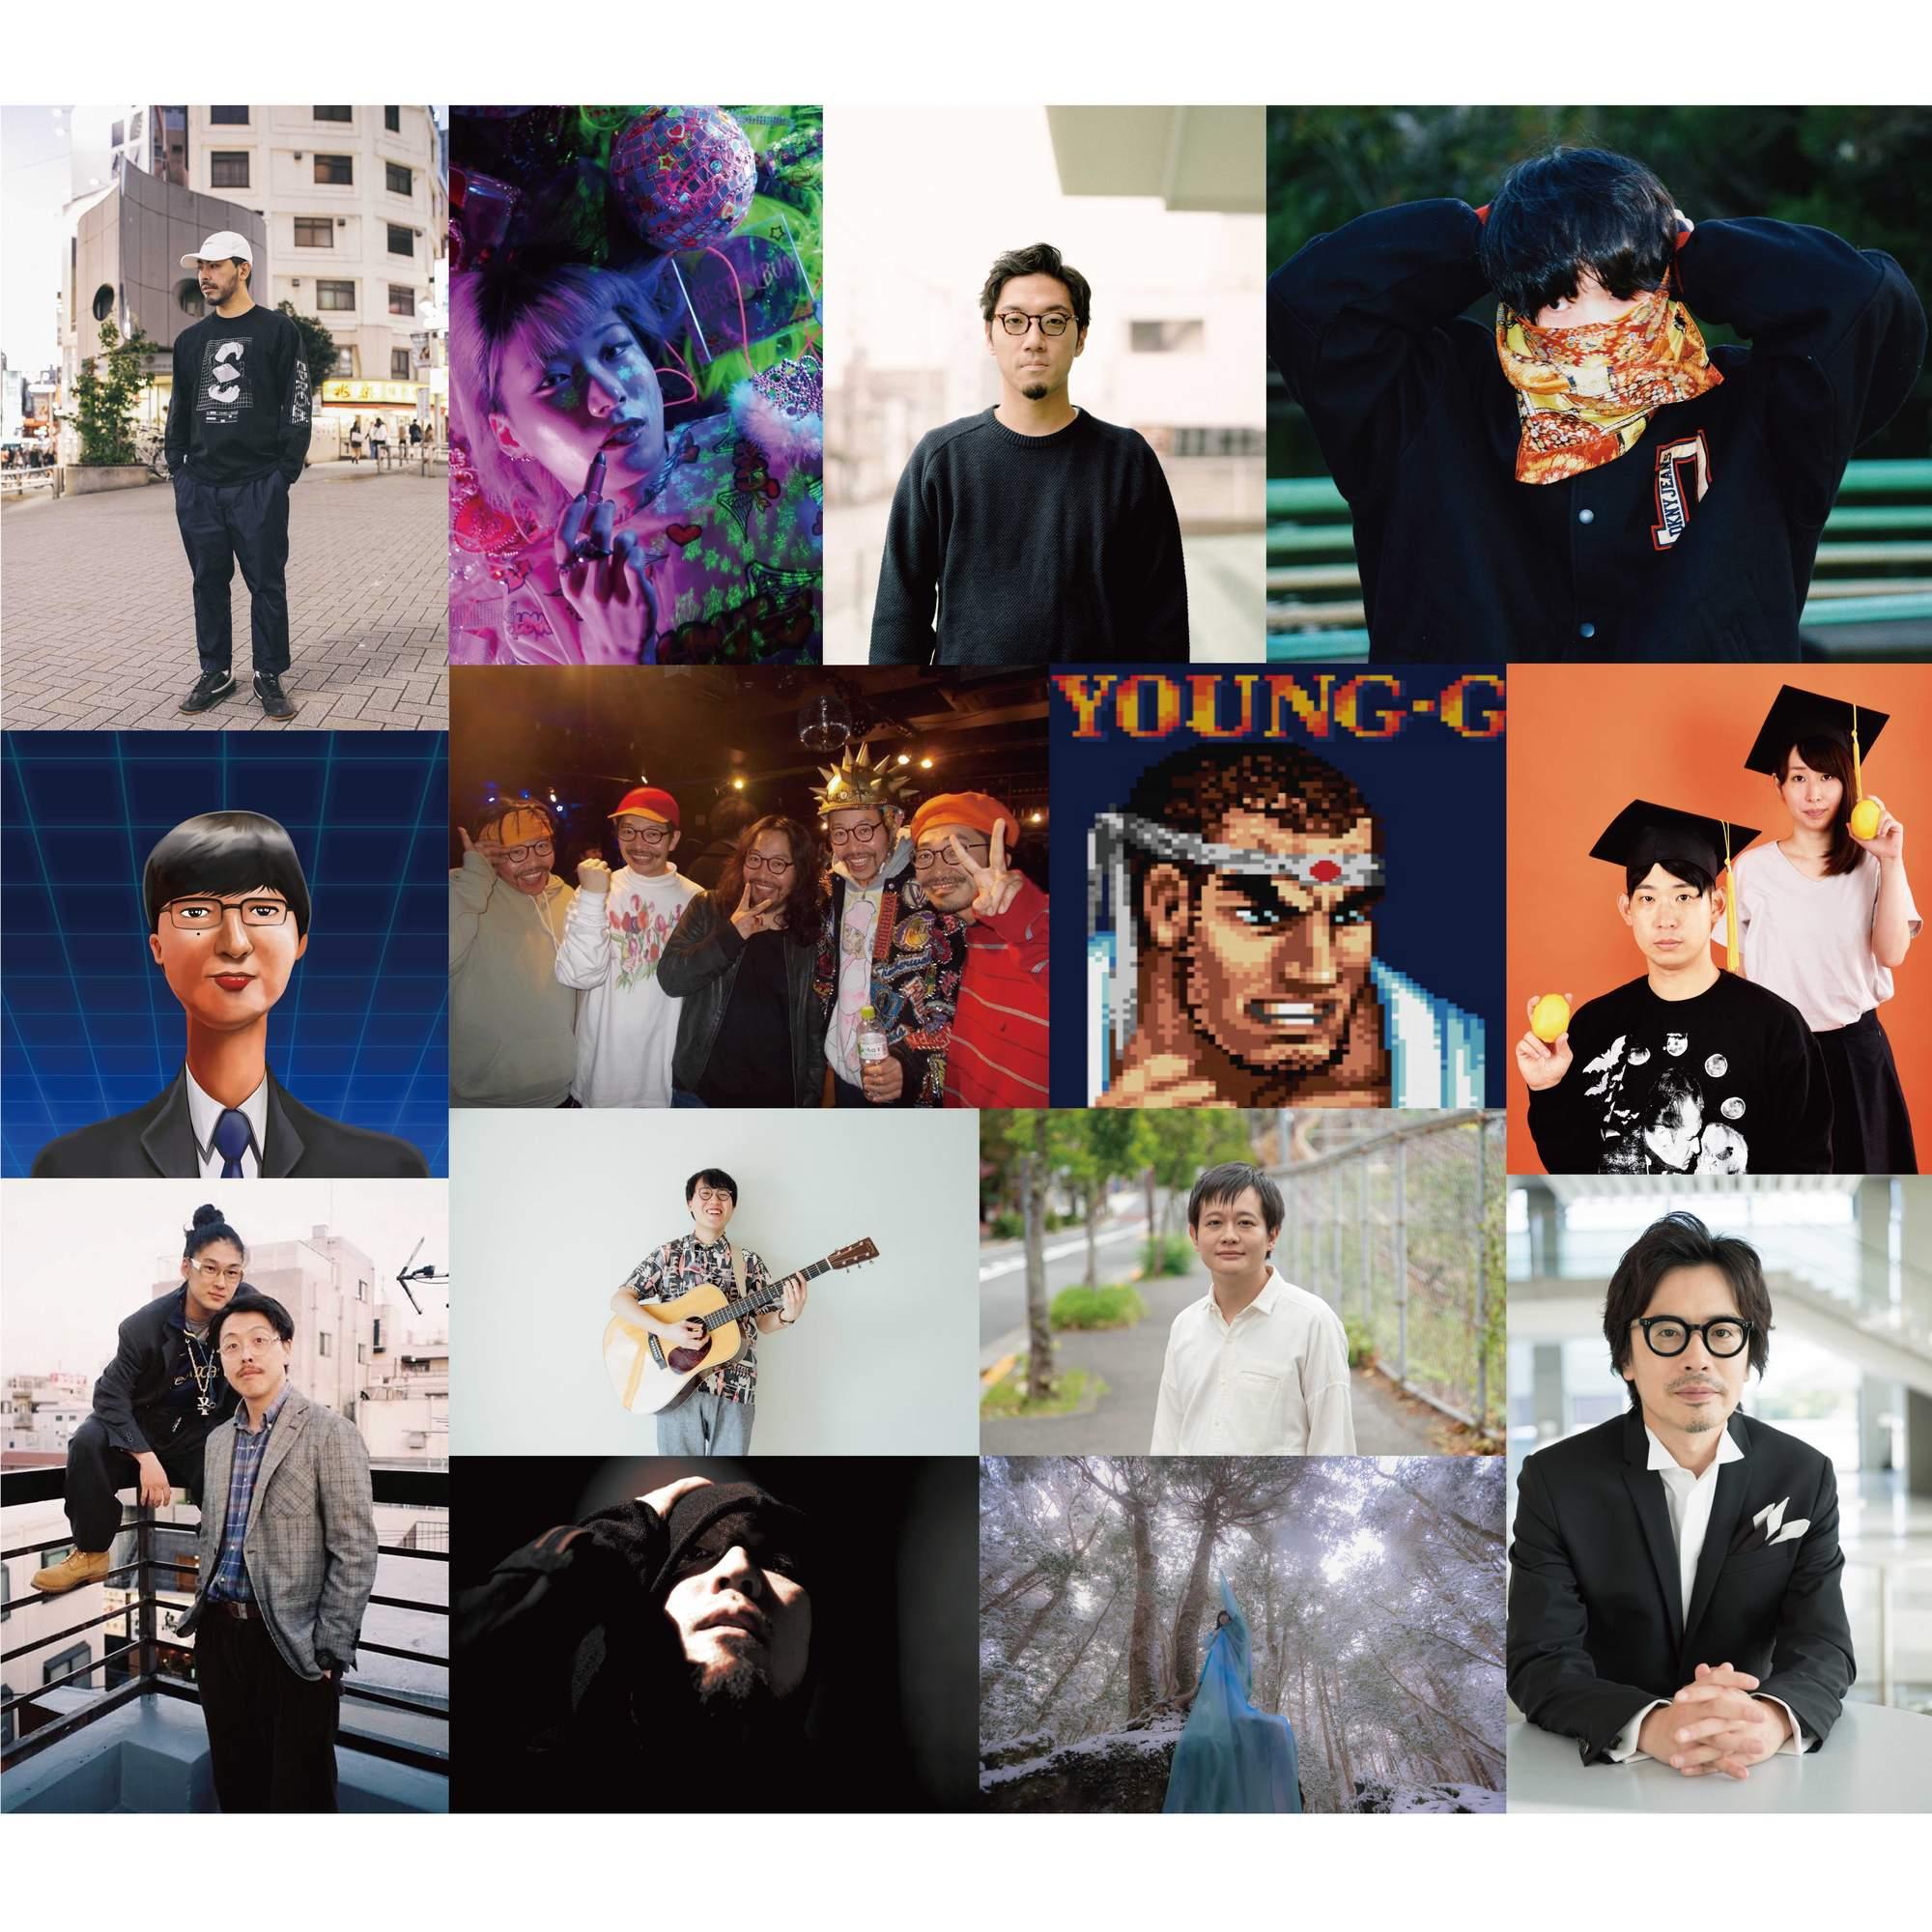 http://rose-records.jp/files/20201120152131.jpg